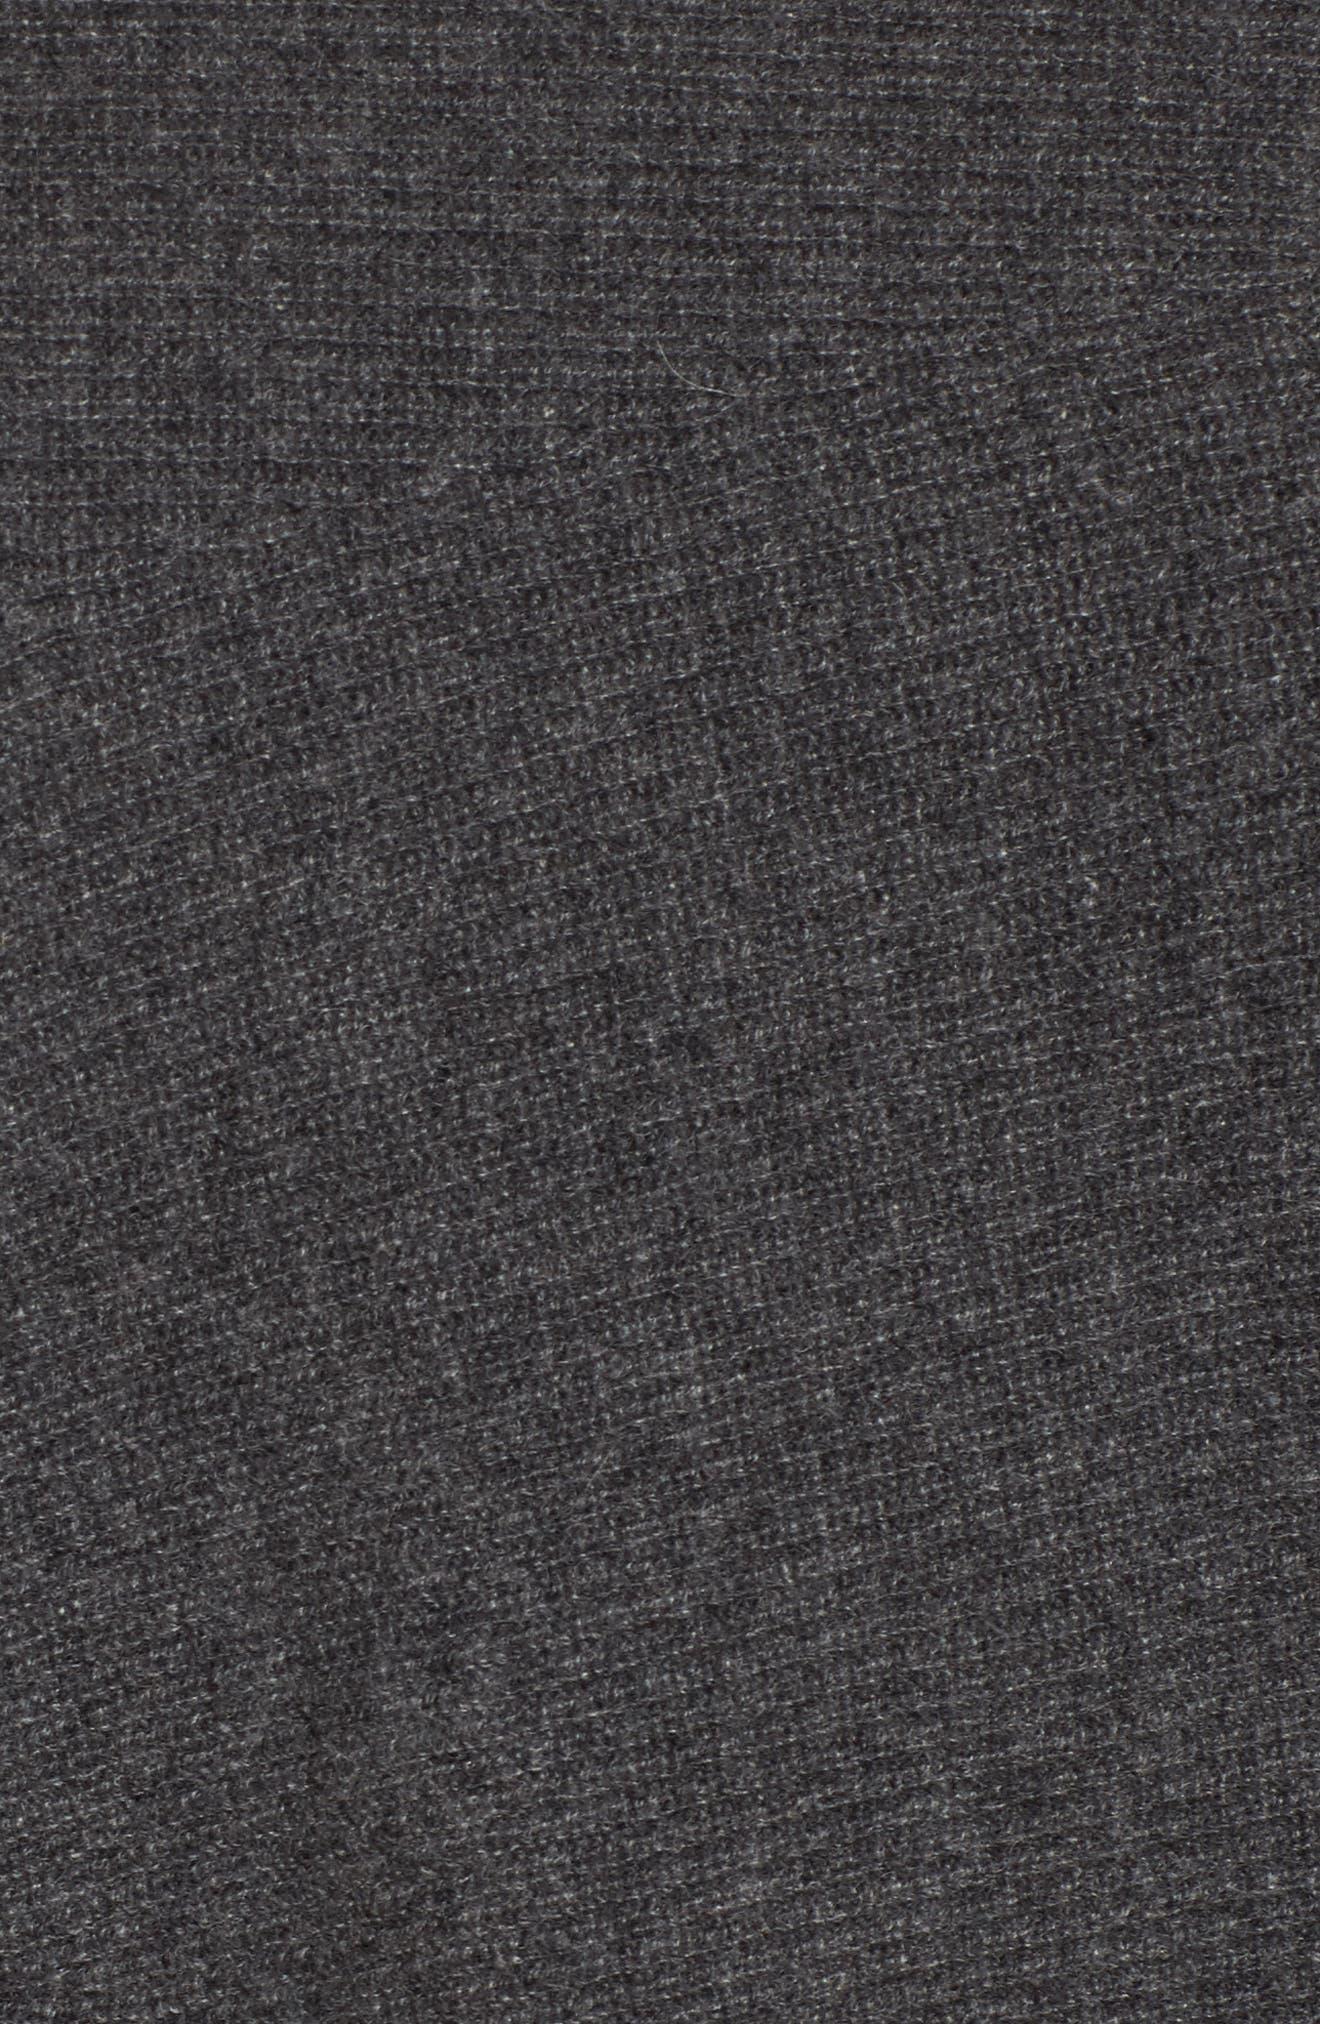 Dolman Sleeve Cashmere Sweater,                             Alternate thumbnail 5, color,                             Grey Castlerock Heather